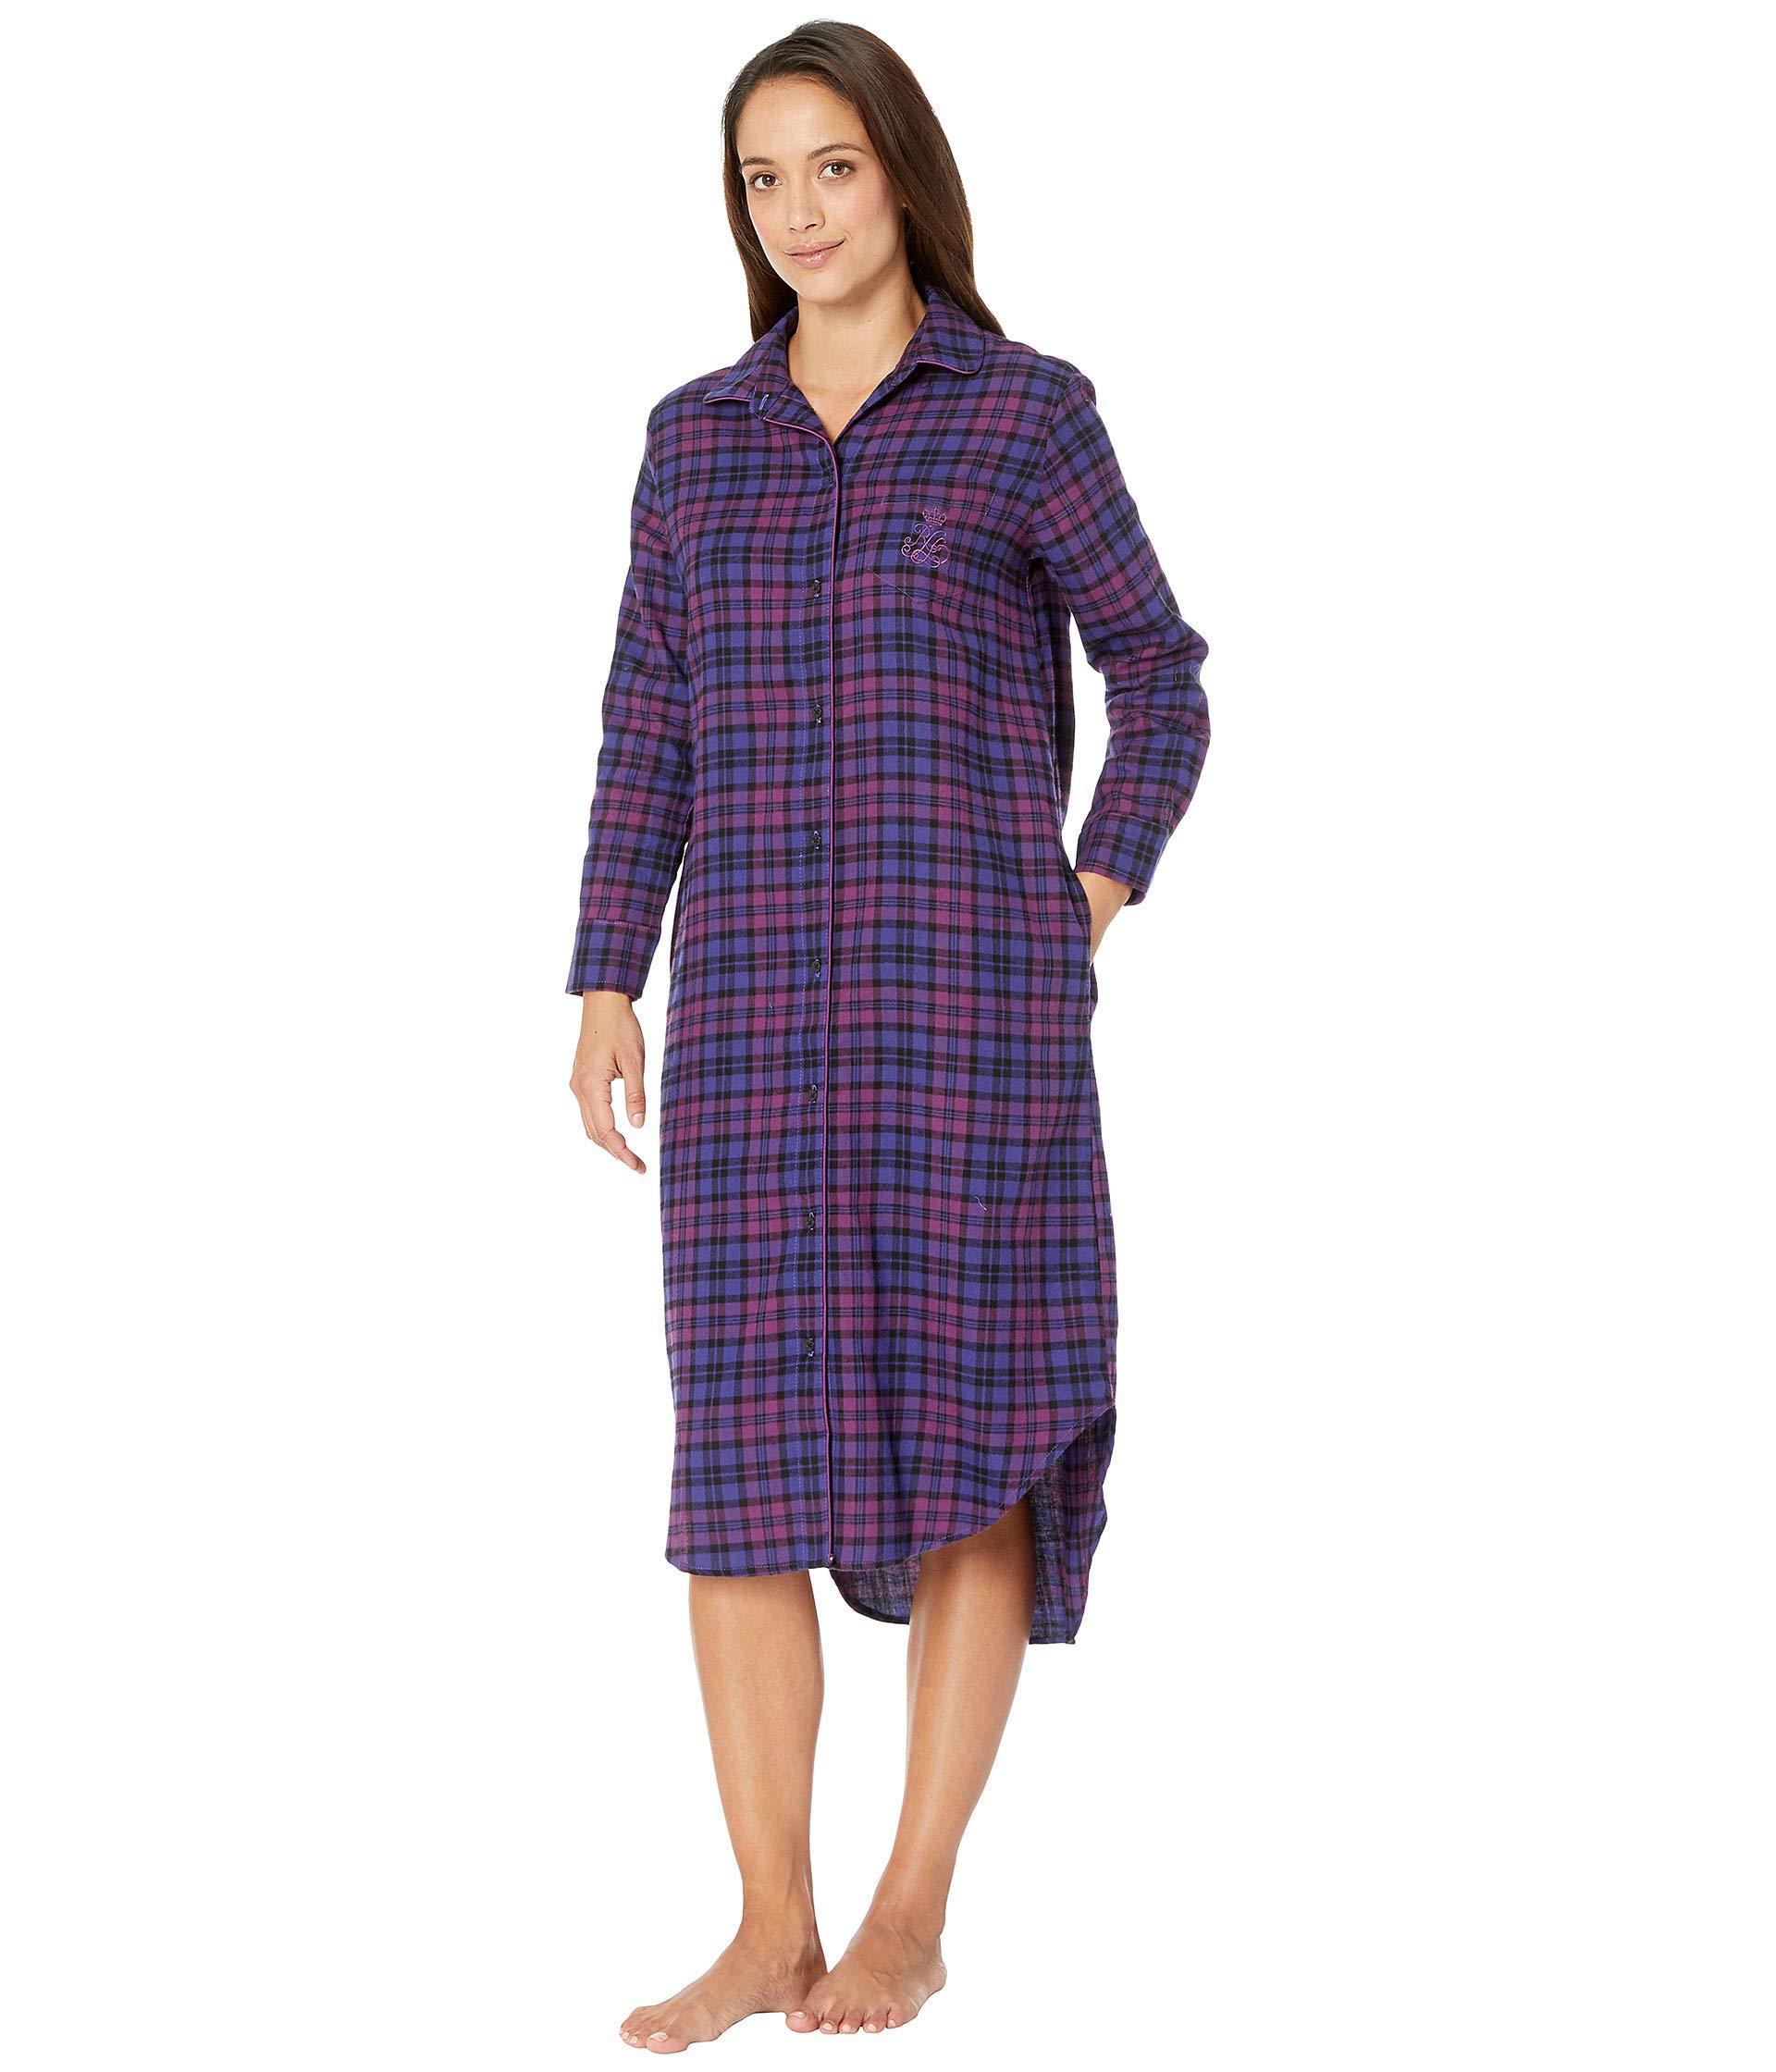 efd394c7f01 Lyst - Lauren by Ralph Lauren Petite Long Sleeve Ballet Length Sleepshirt  in Purple - Save 33.33333333333333%